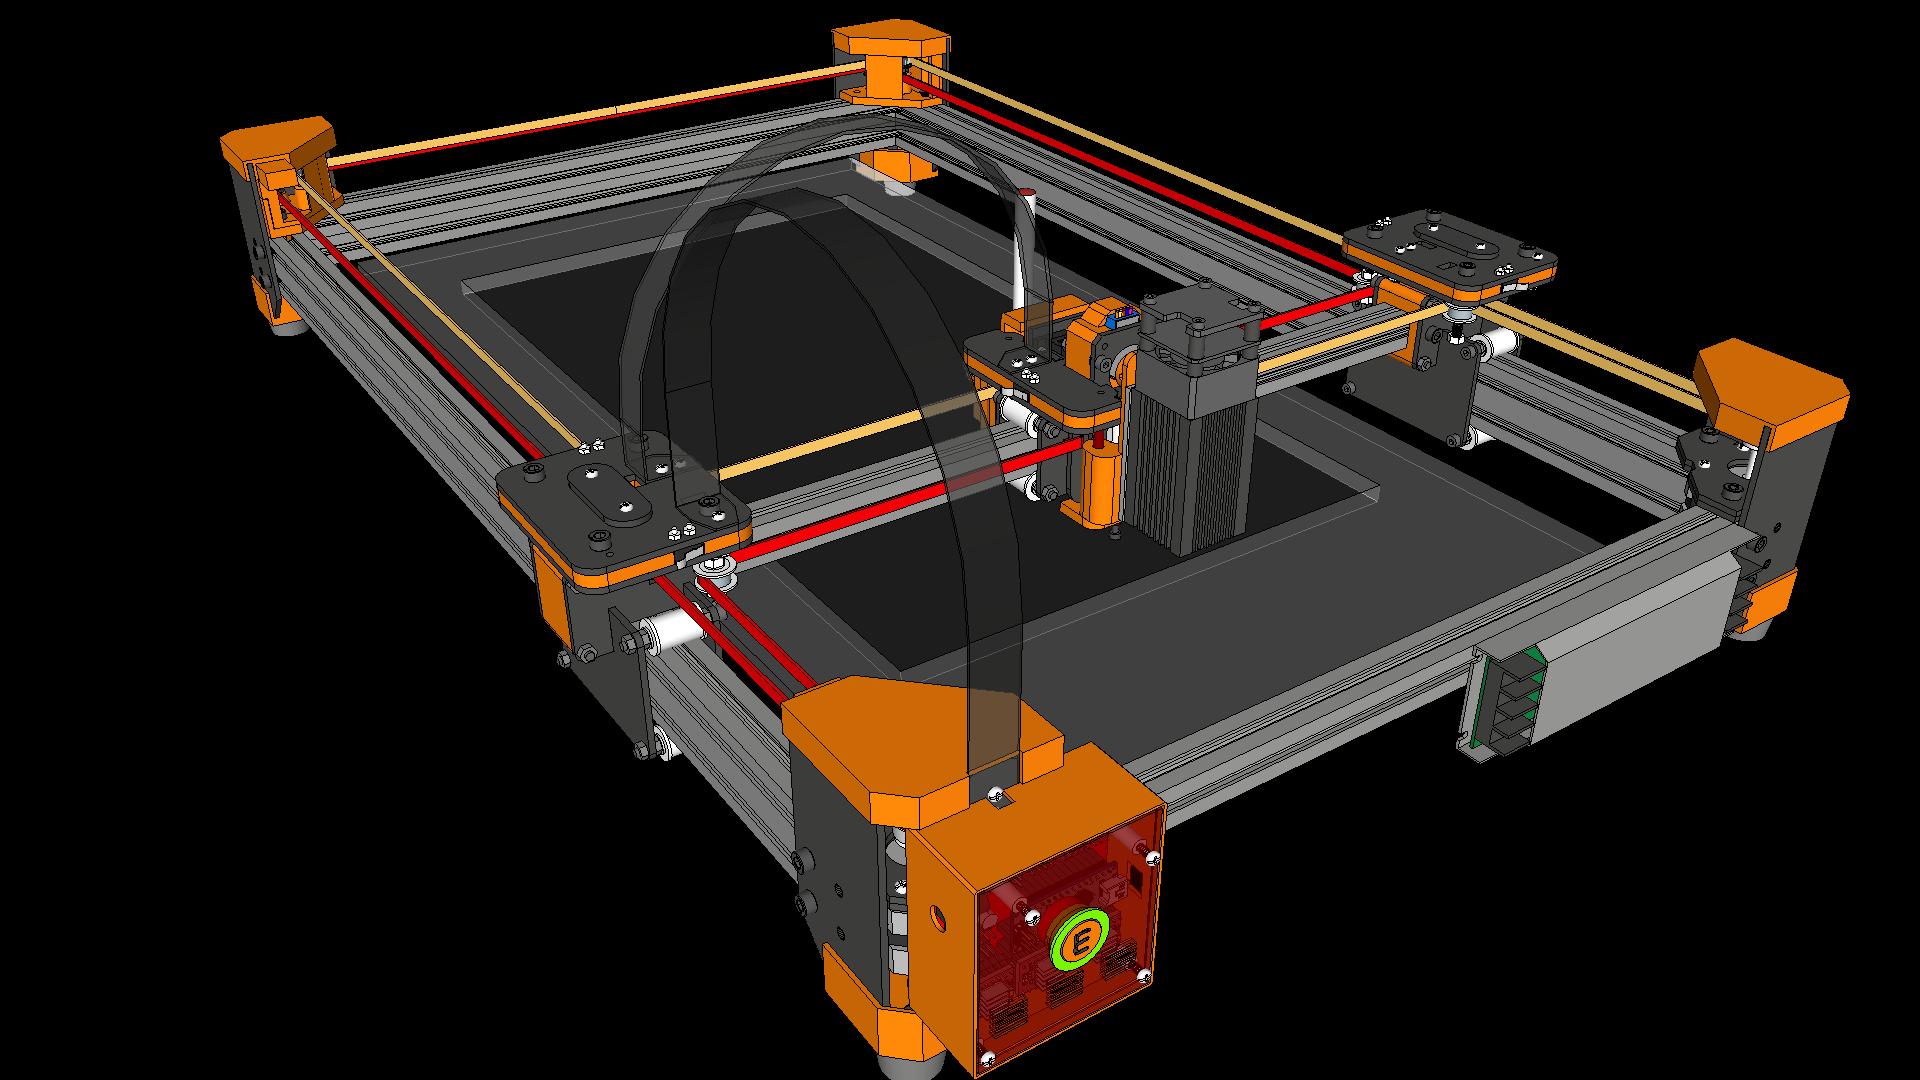 Zalophus's DesignHouse – Robotics, Home IoT, Home Automation, Home